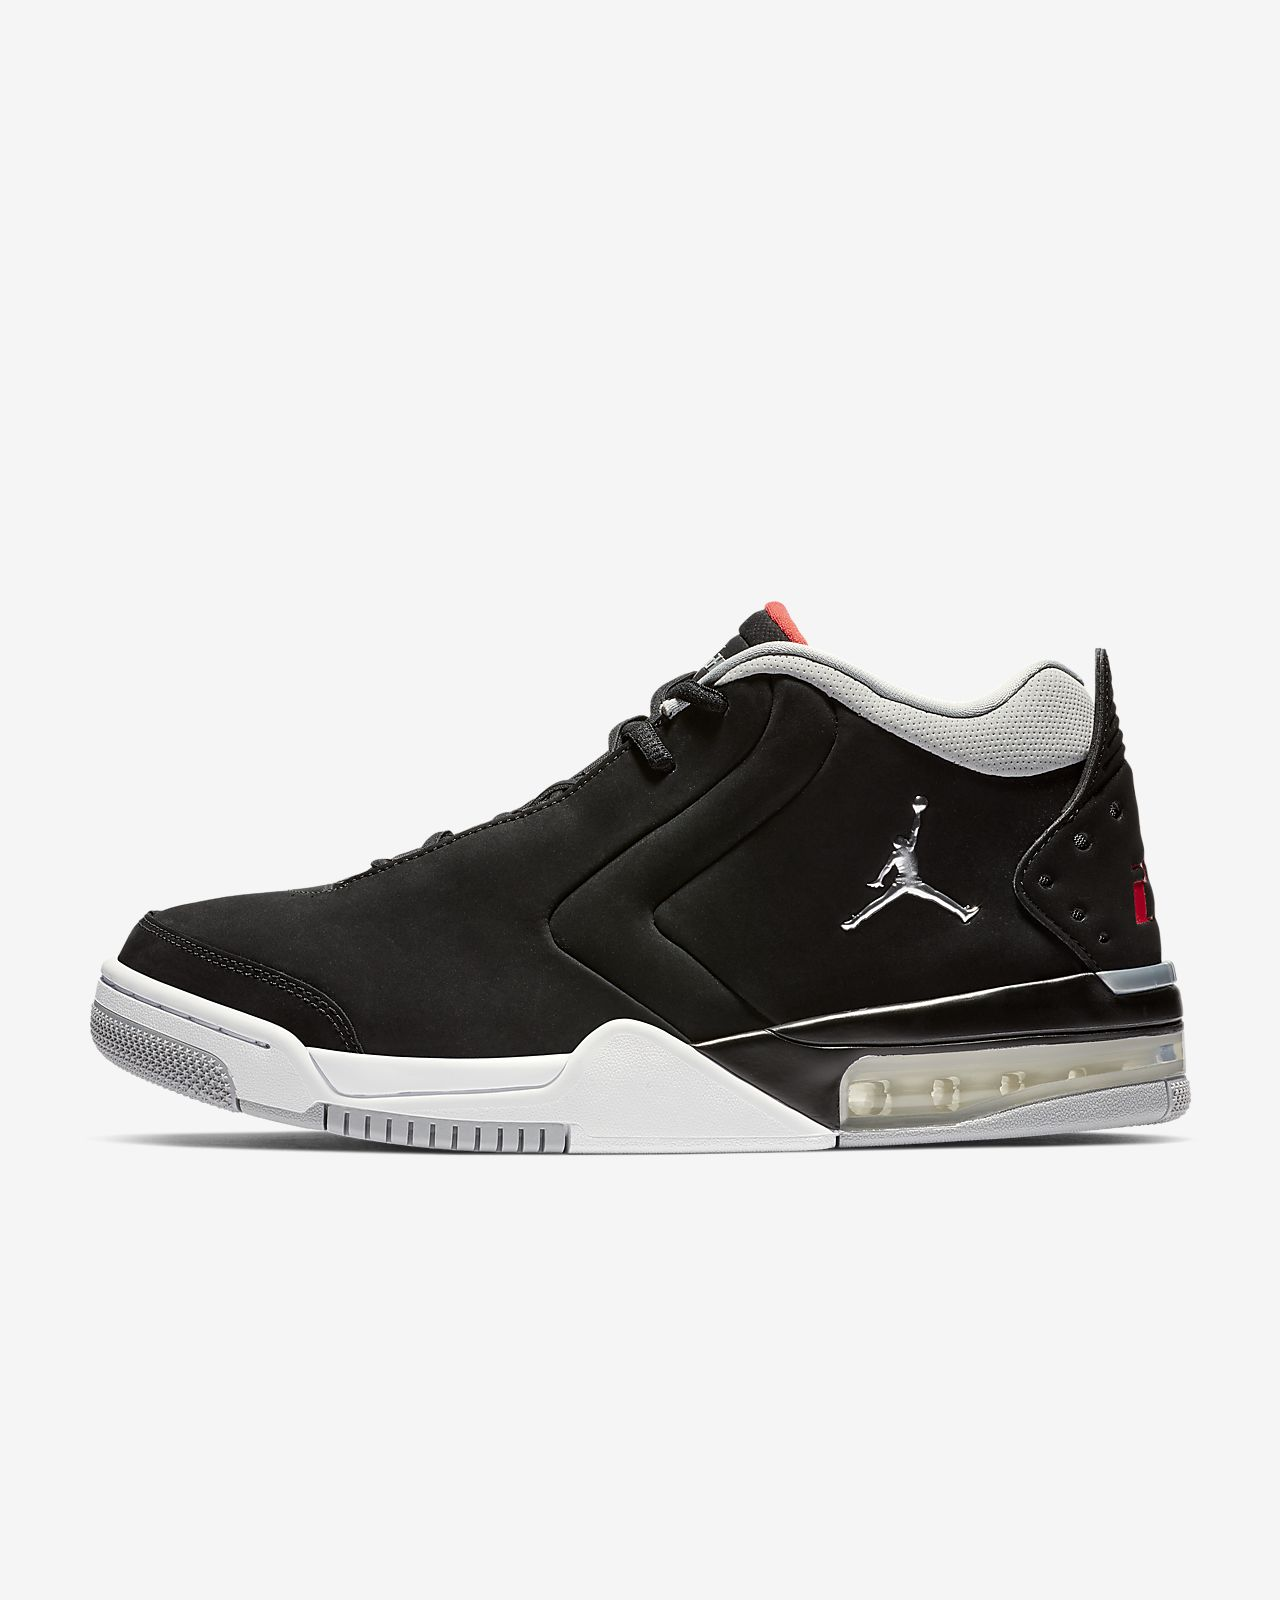 Big Chaussure Fund Pour Jordan Homme Yb7yIg6fv